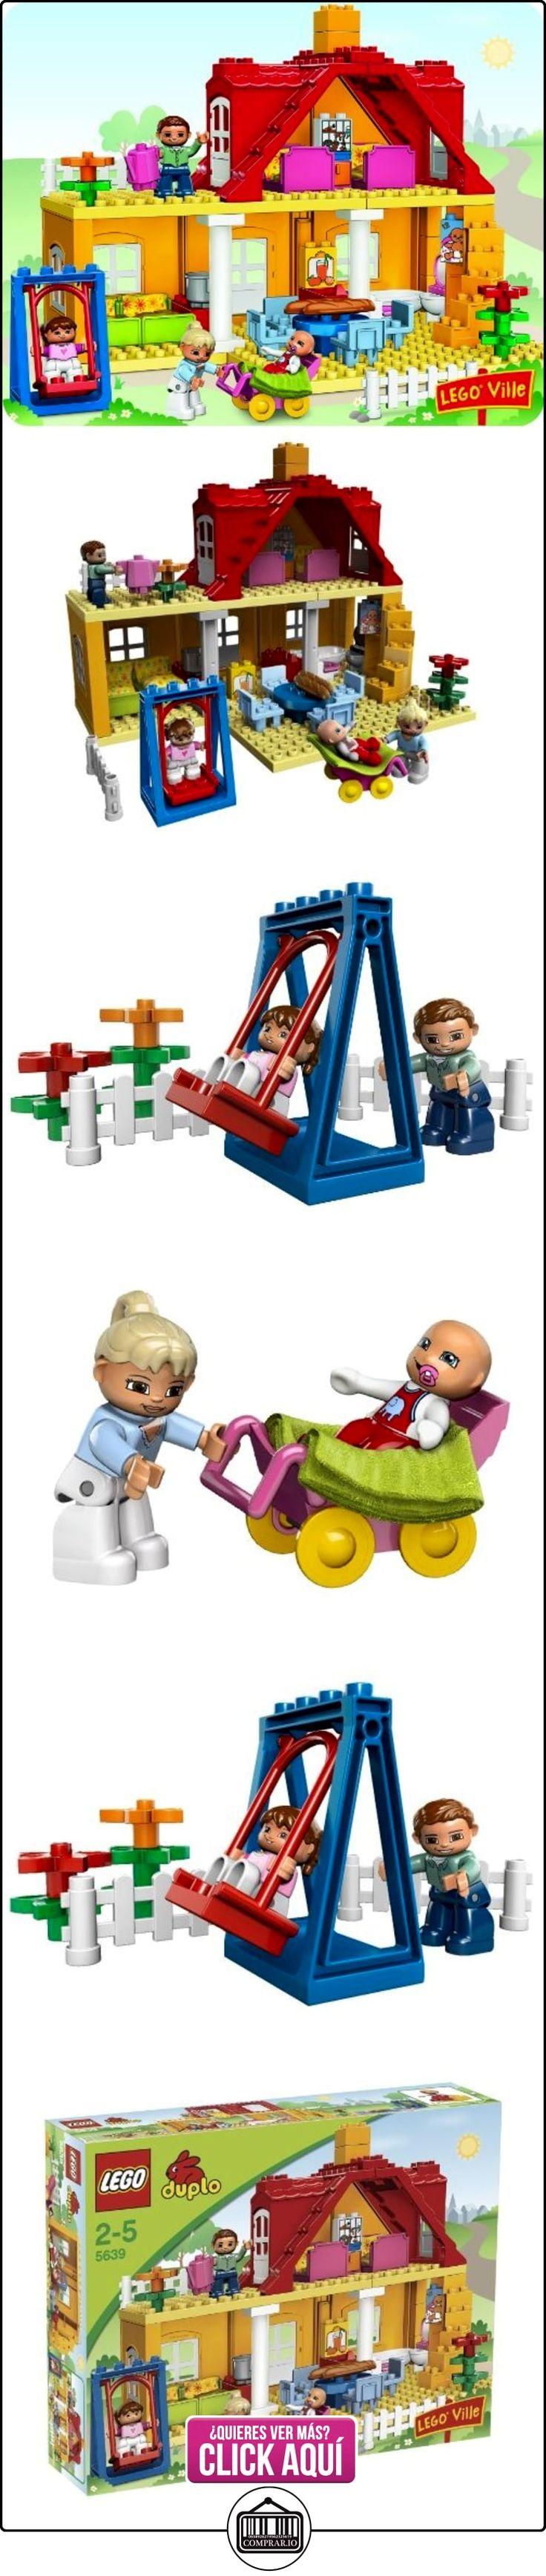 17 best ideas about lego duplo on pinterest lego duplo. Black Bedroom Furniture Sets. Home Design Ideas